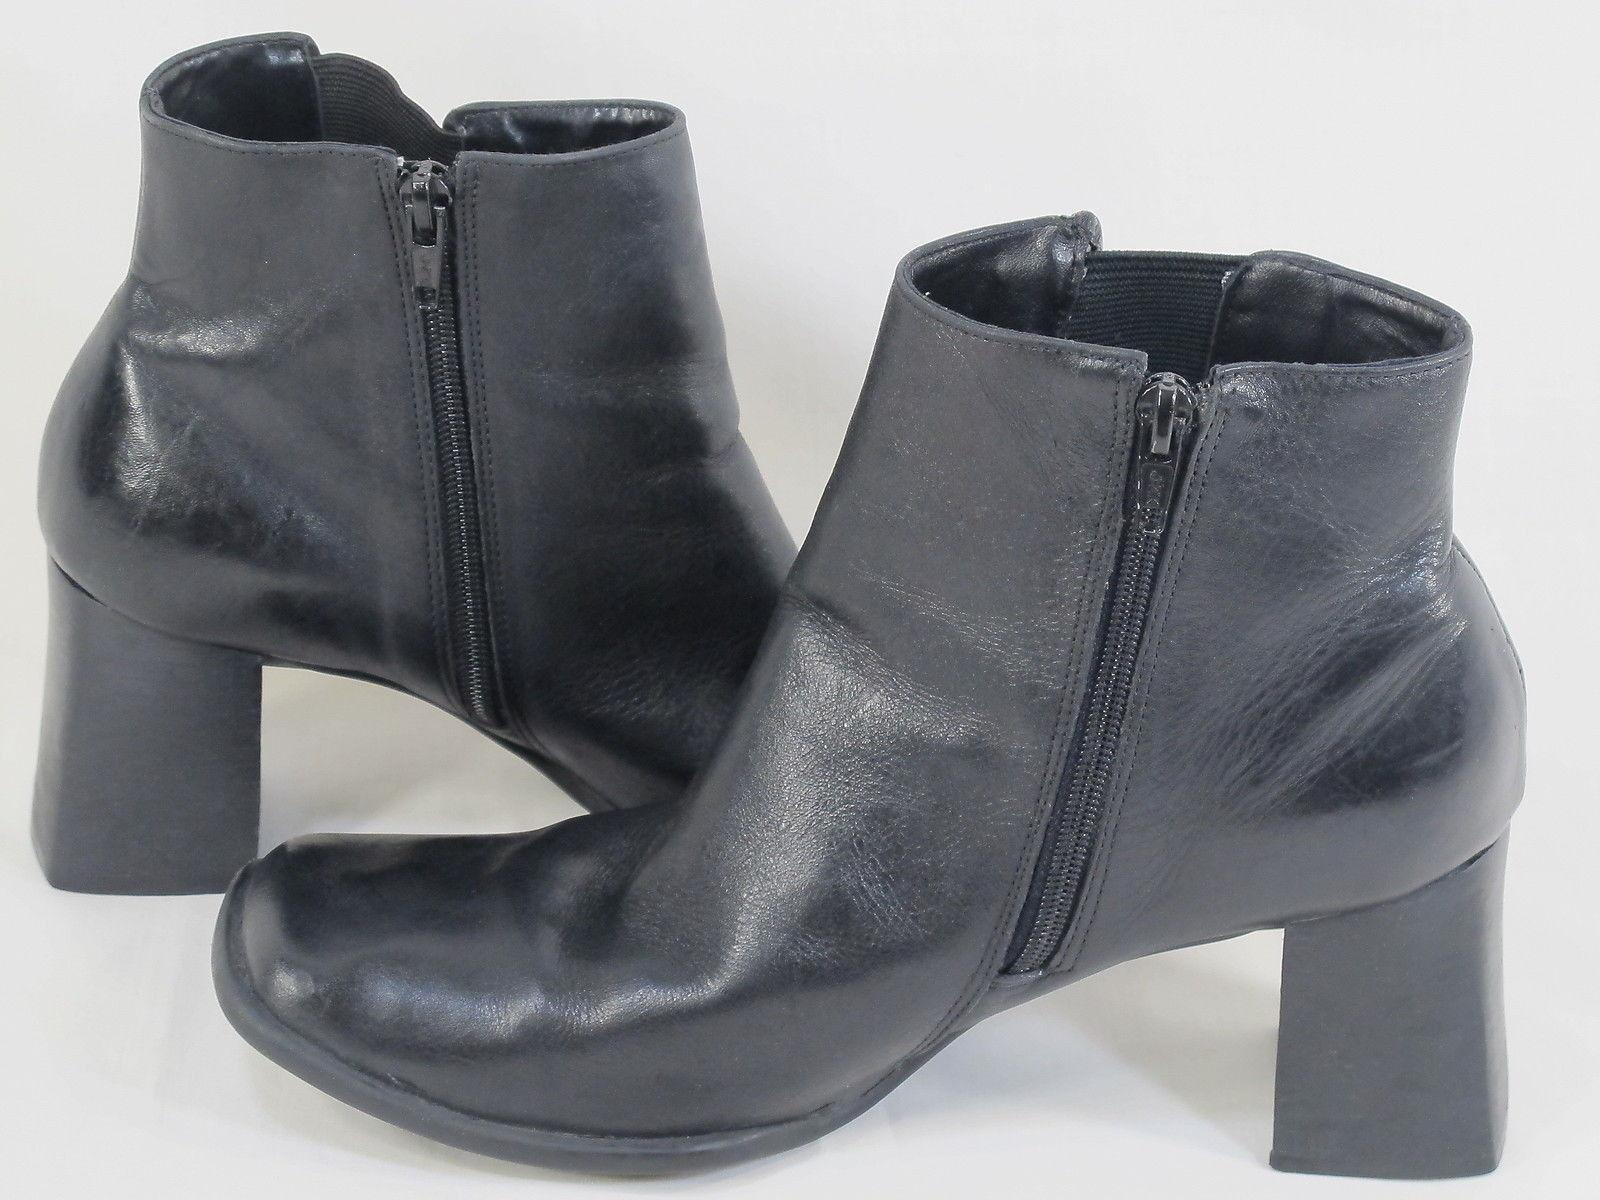 Diana Ferrari Black Leather Brazil Fashion Ankle Boots Size 8.5 M US Excellent Brazil Leather 543641